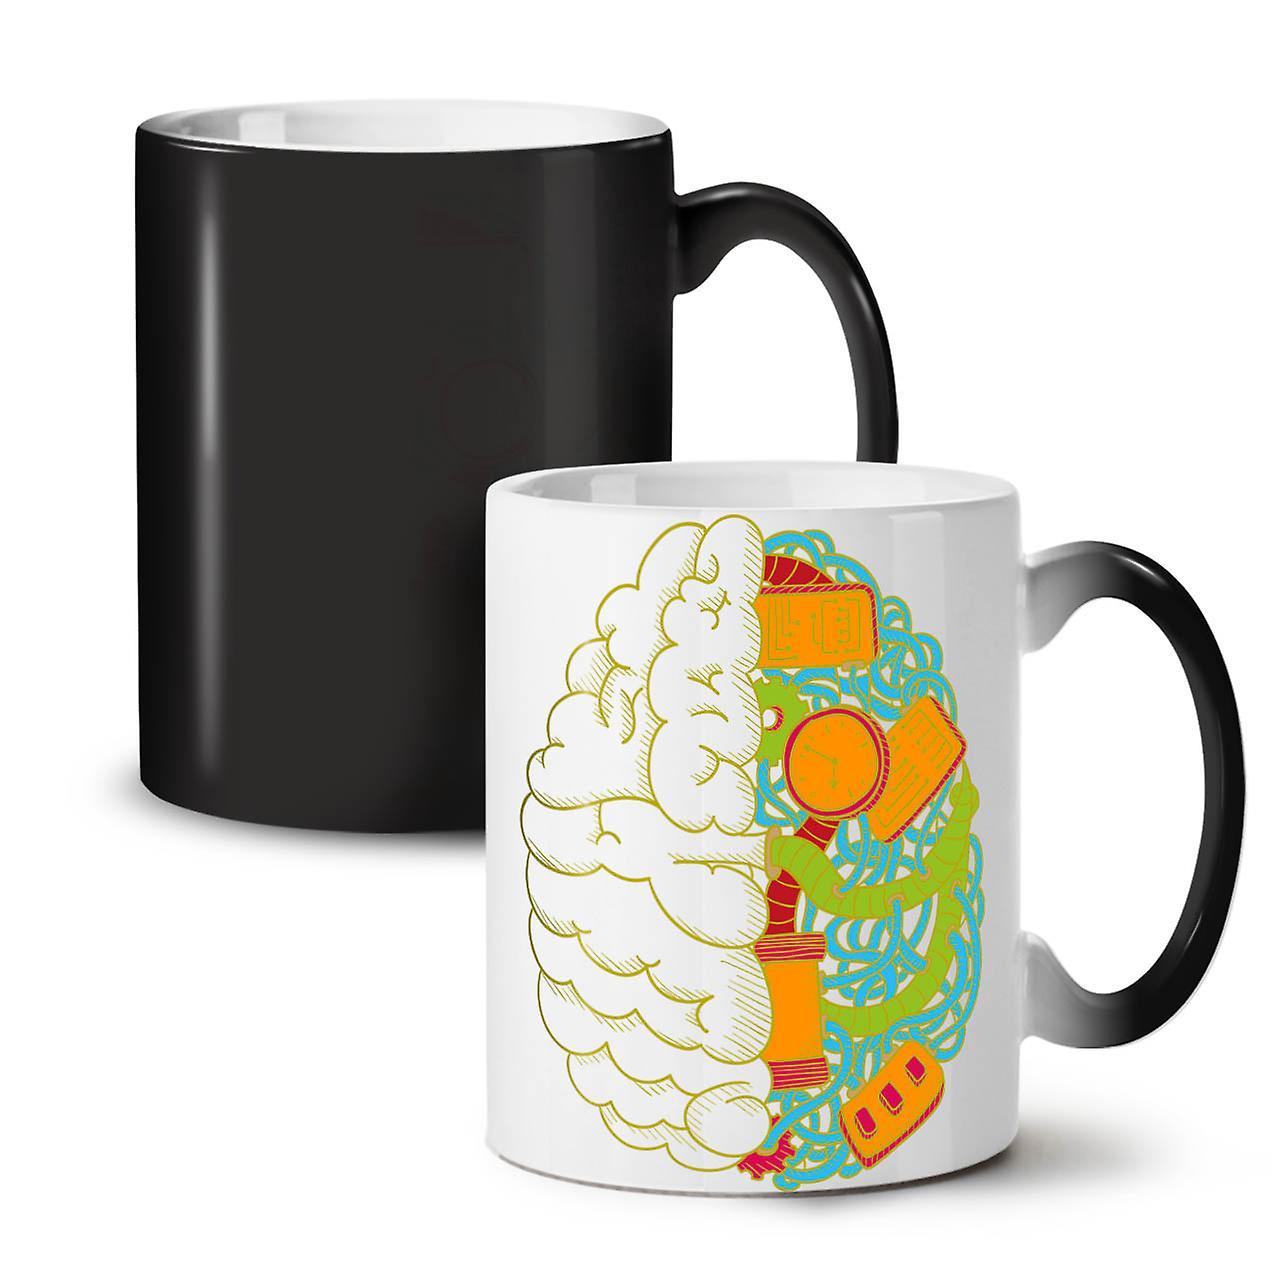 Changing Mug Computer Black Brain Geek New Tea Ceramic 11 OzWellcoda Coffee Colour KcF3uTlJ51